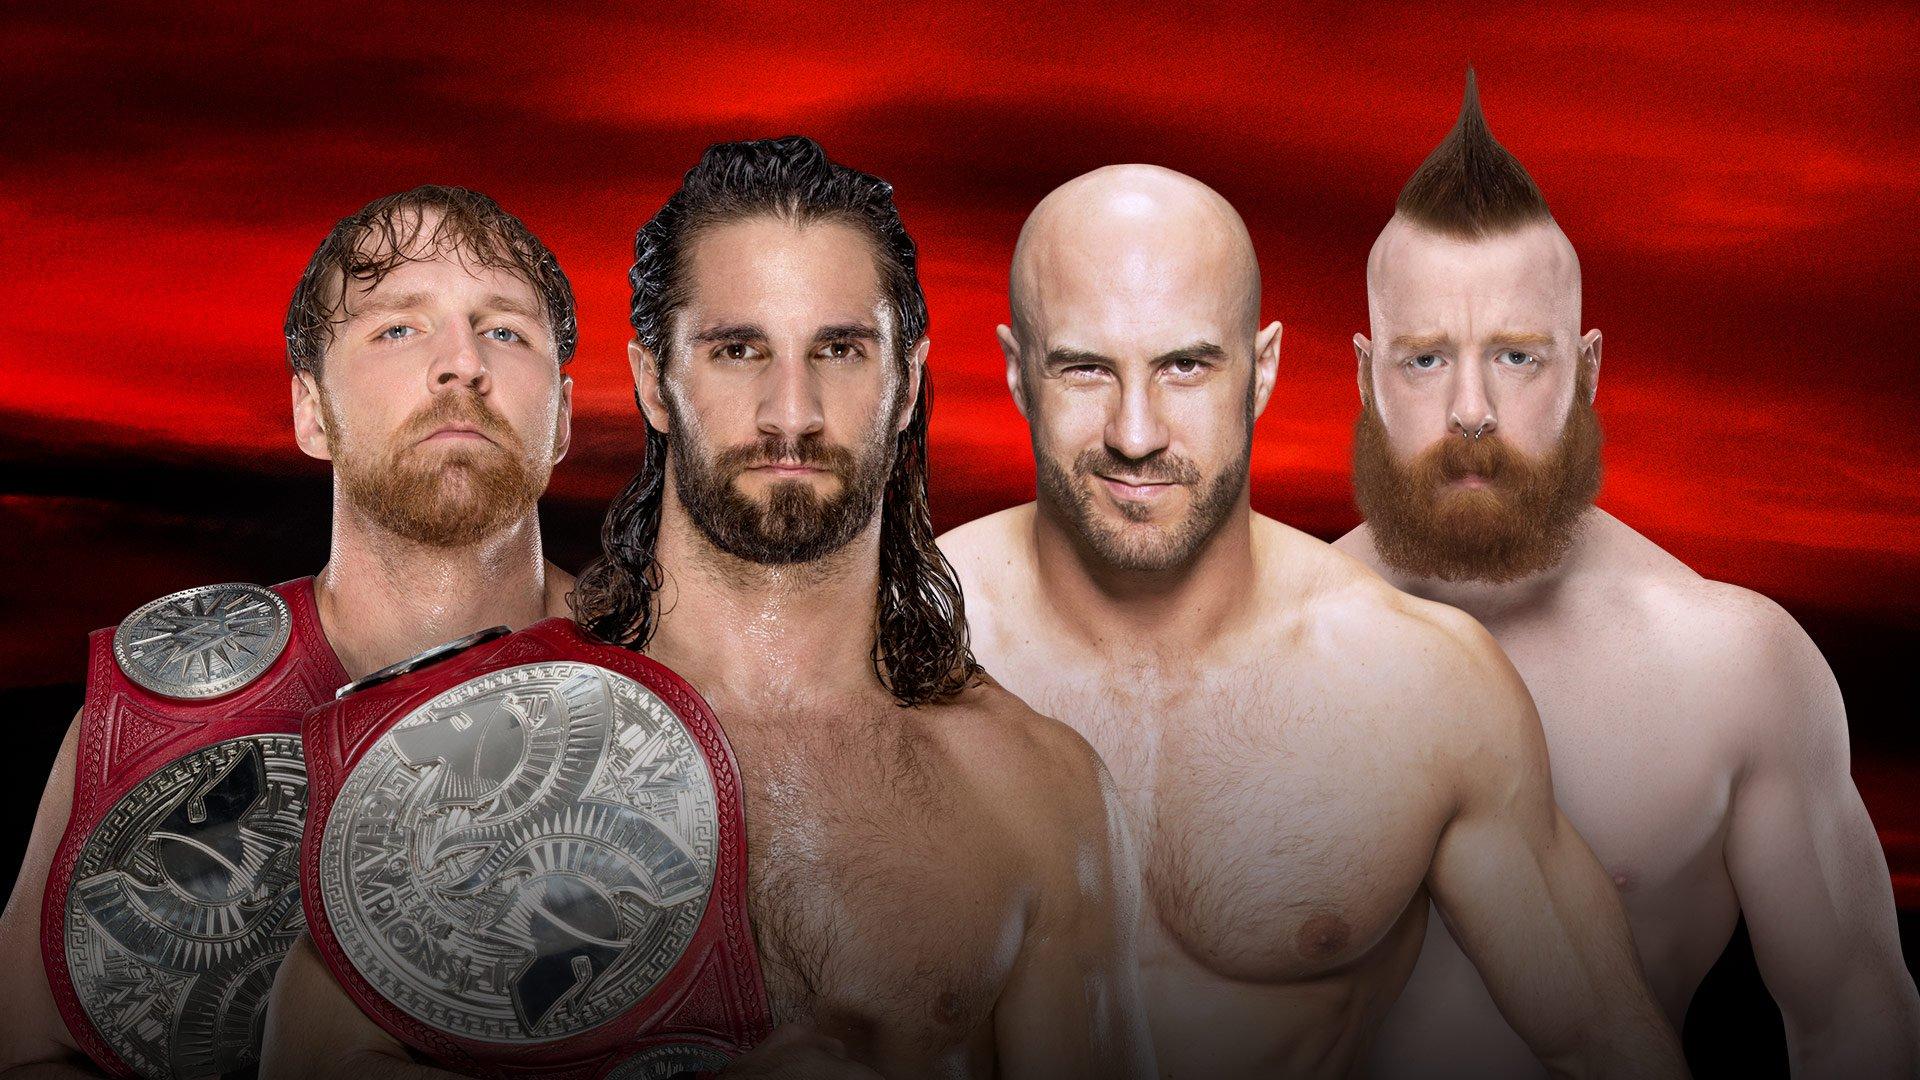 WWE No Mercy 2017: Dean Ambrose & Seth Rollins vs. Cesaro & Sheamus